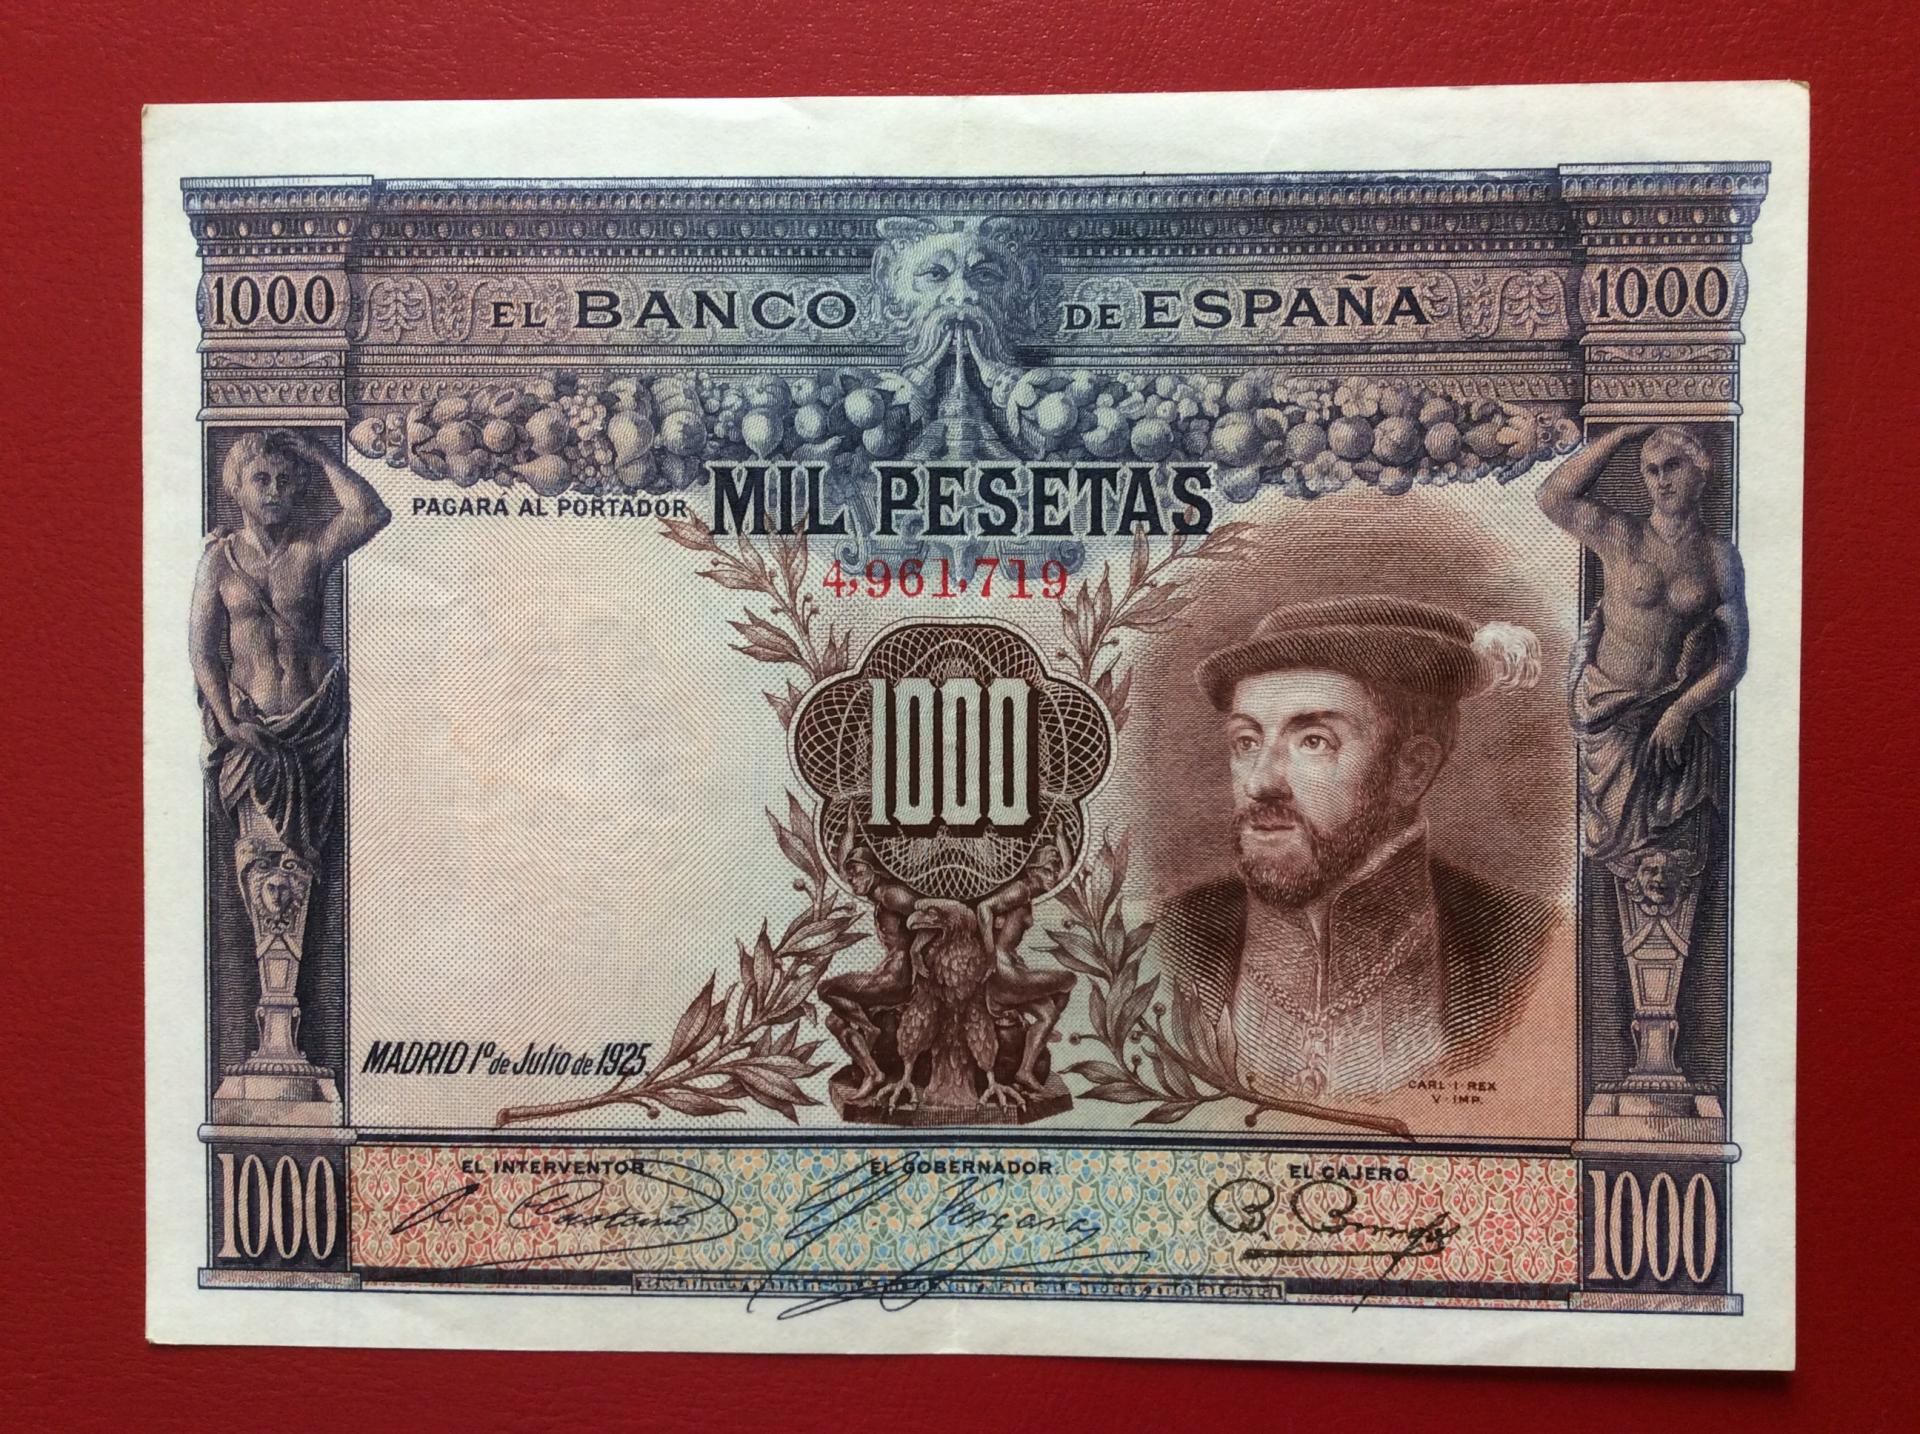 1000 PESETAS 1925 - CARLOS I - EXCELENTE CONSERVACIÓN